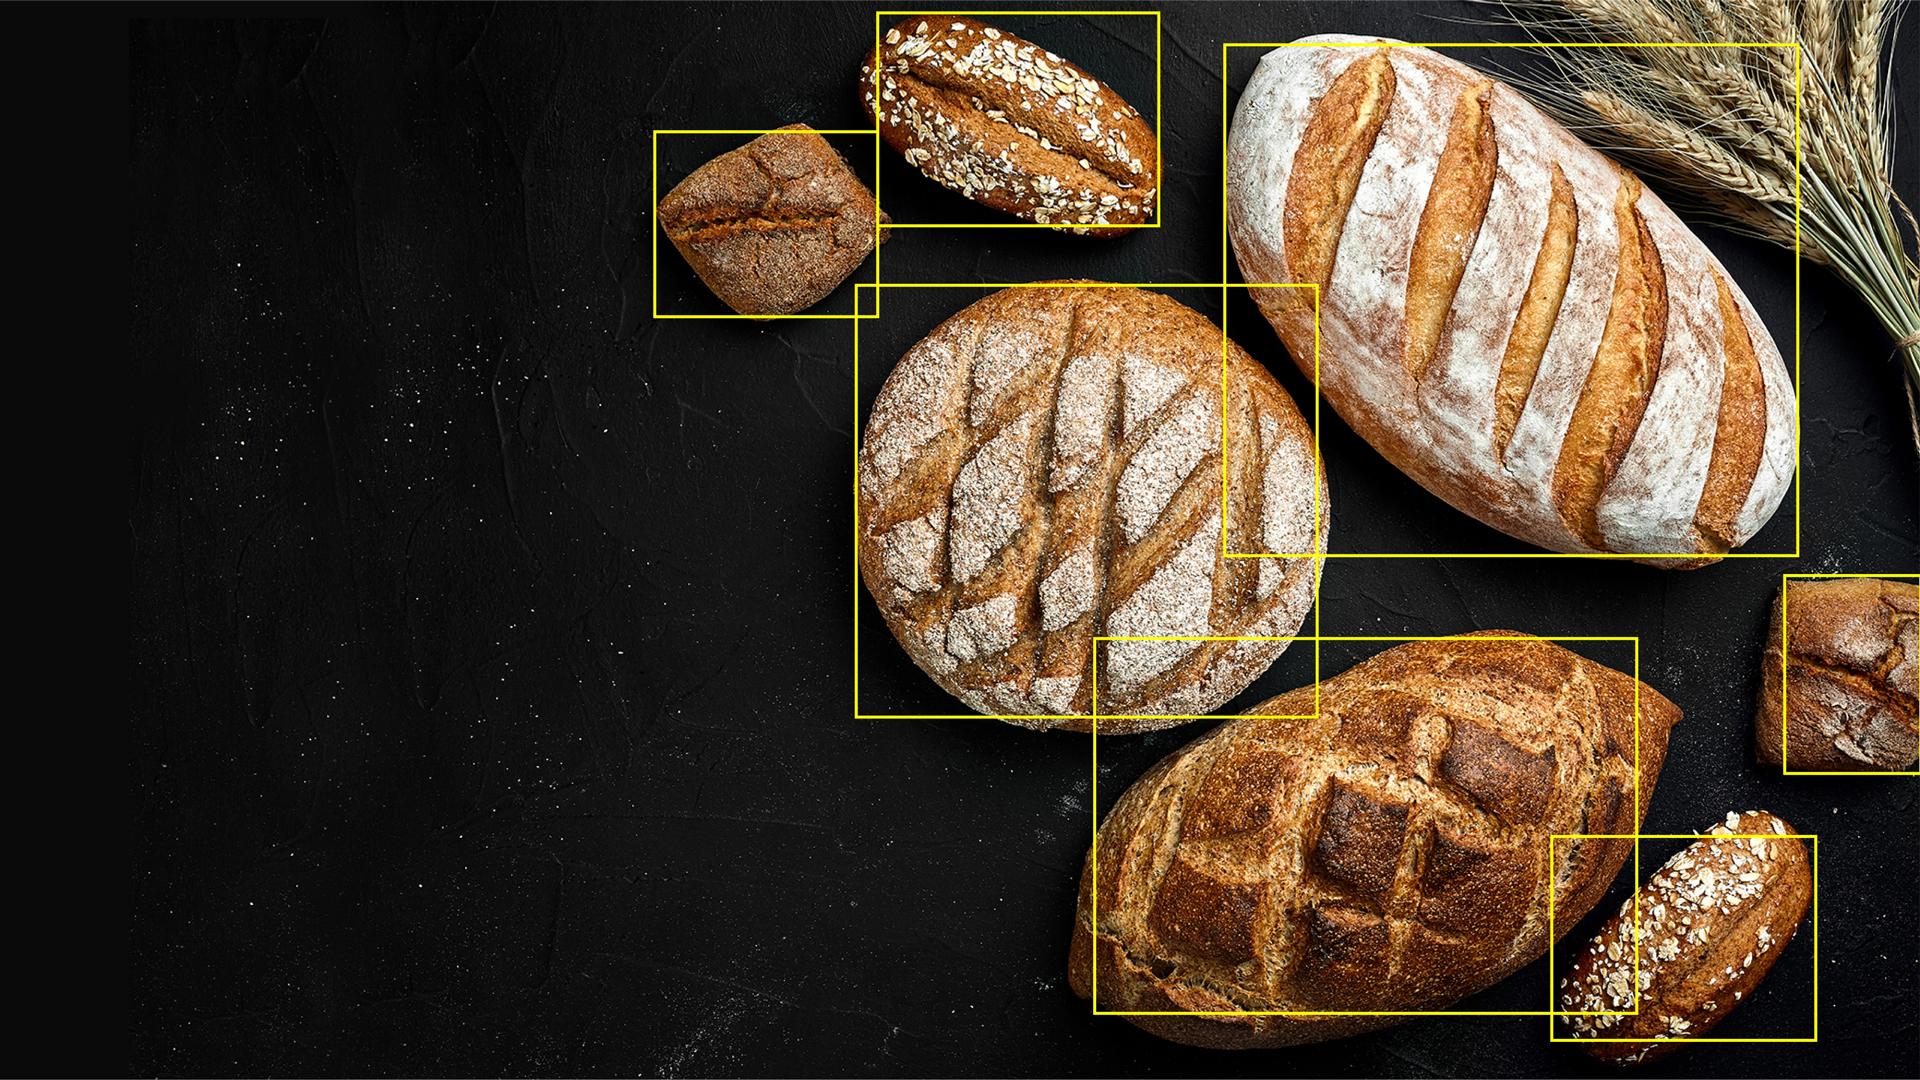 proimages/product-detail/09-Platform/visio-object4.jpg